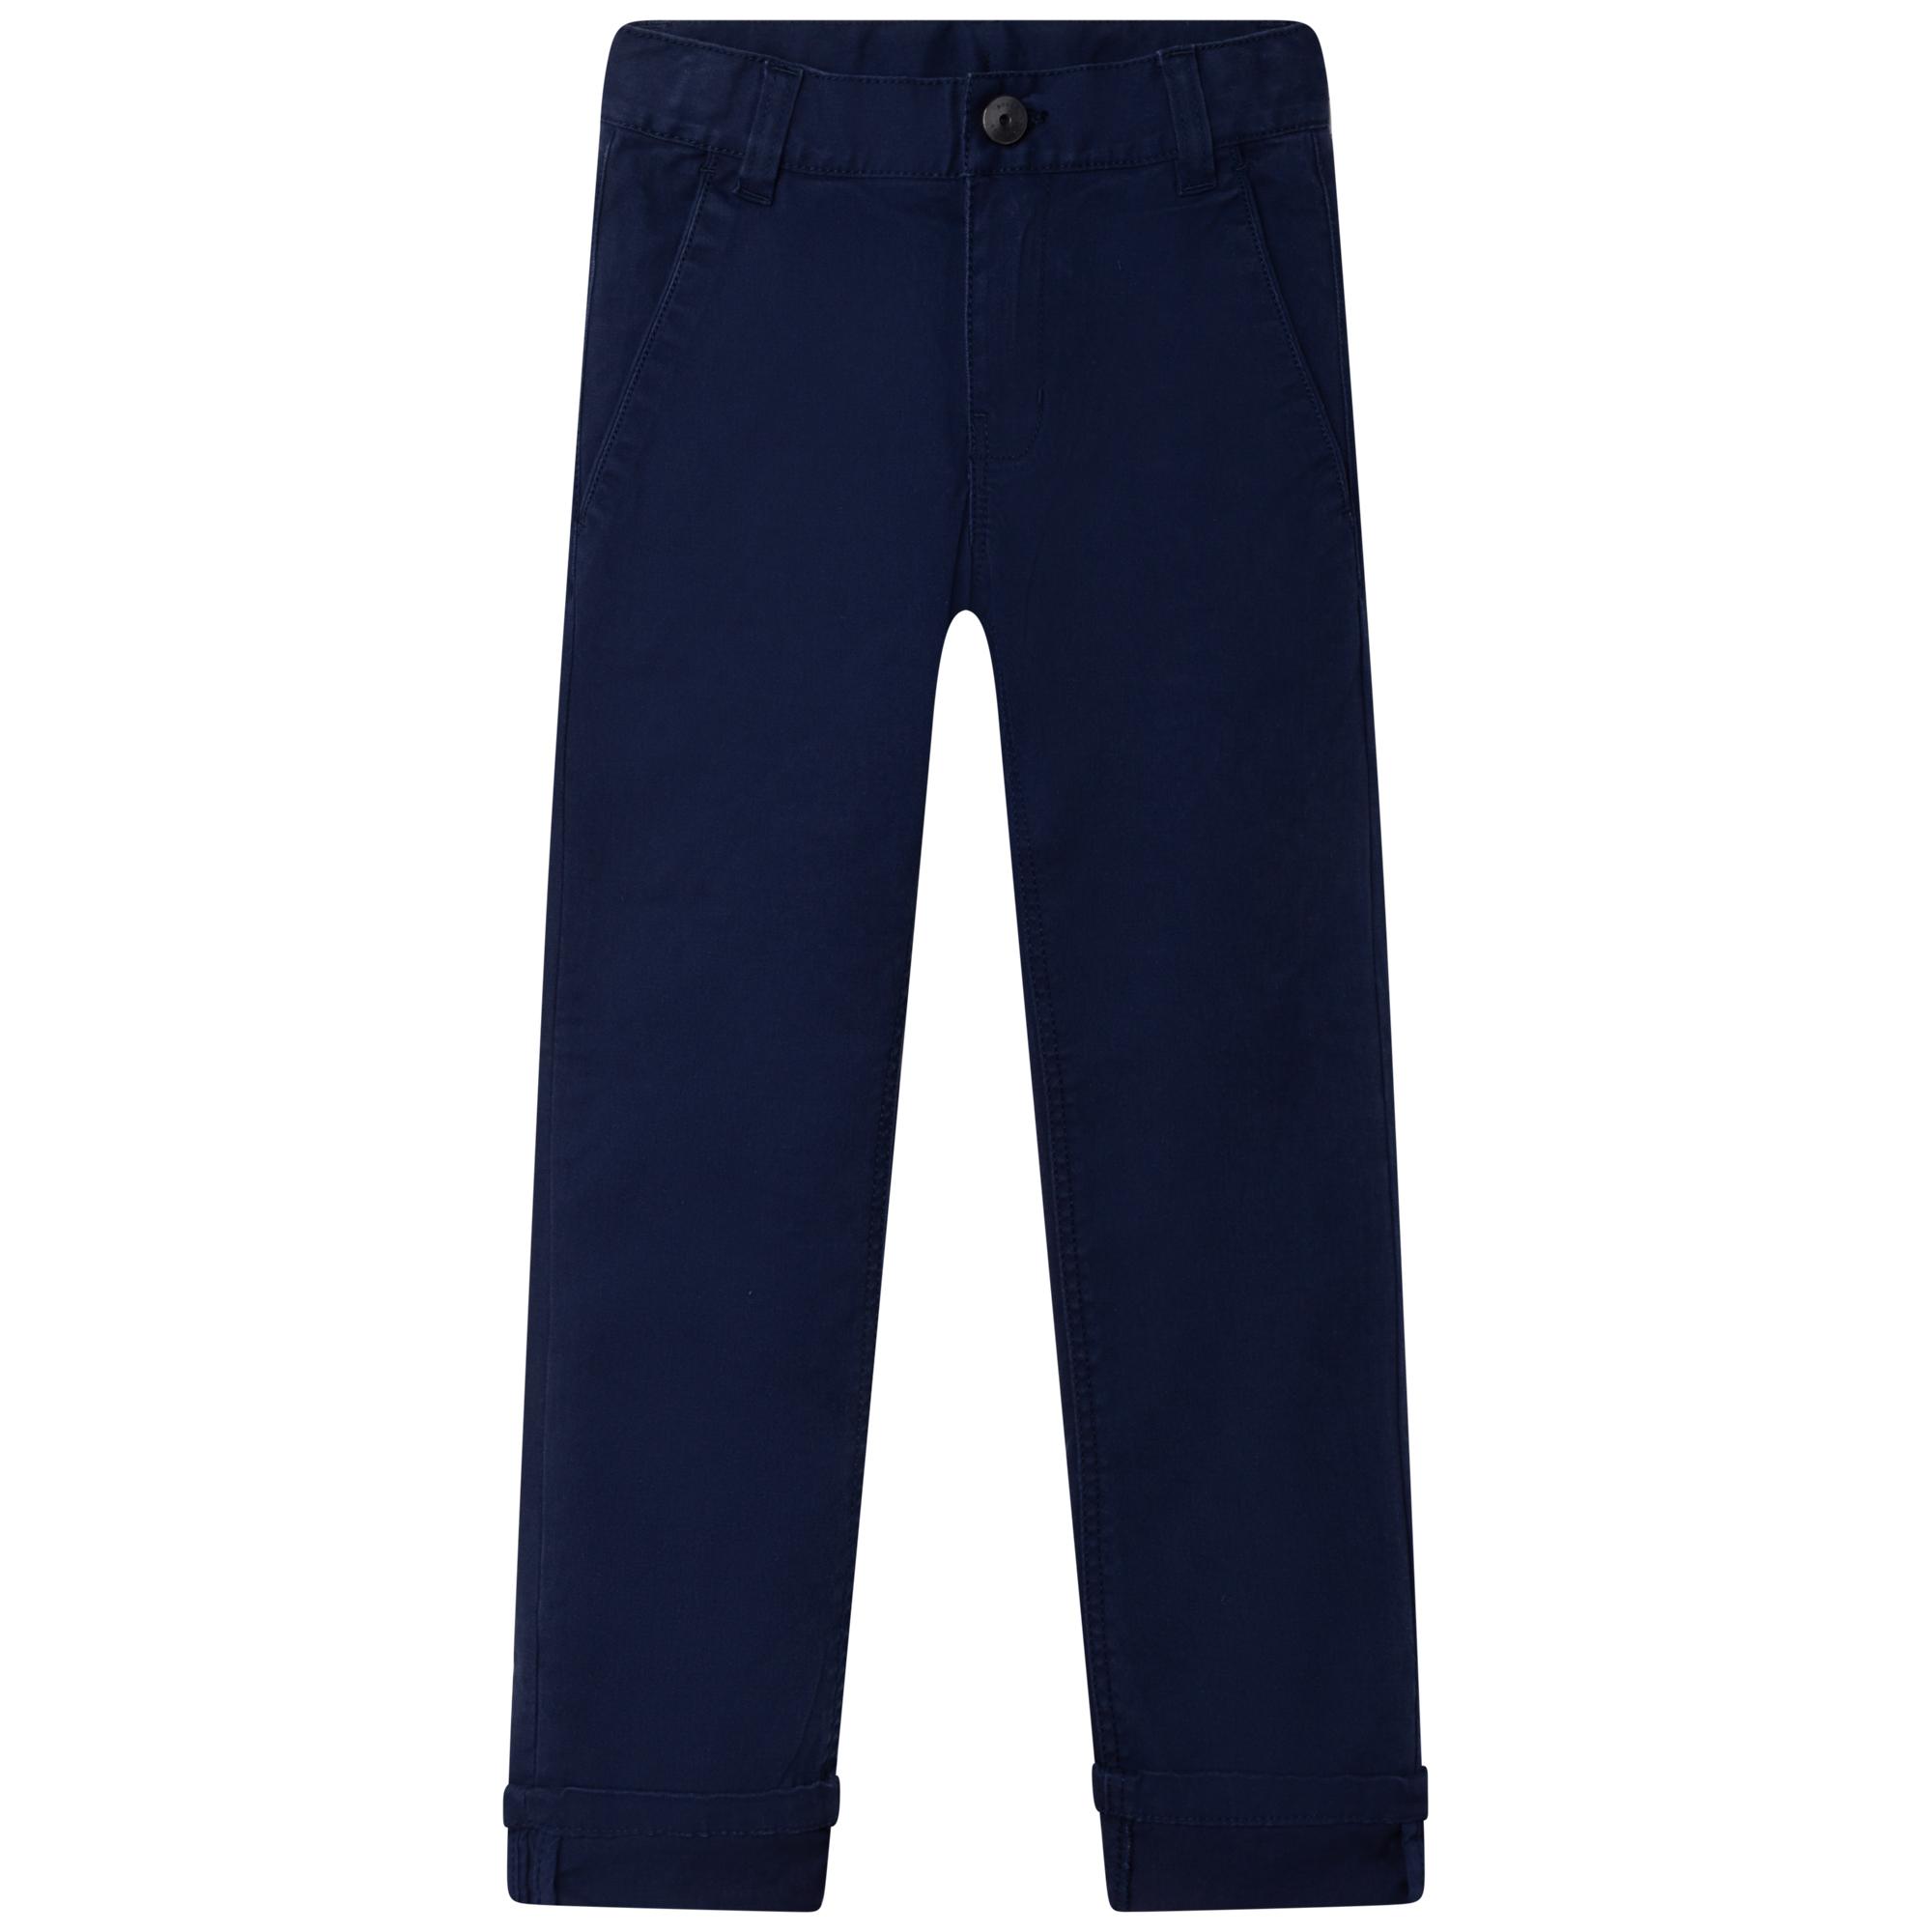 Adjustable cotton pants BOSS for BOY